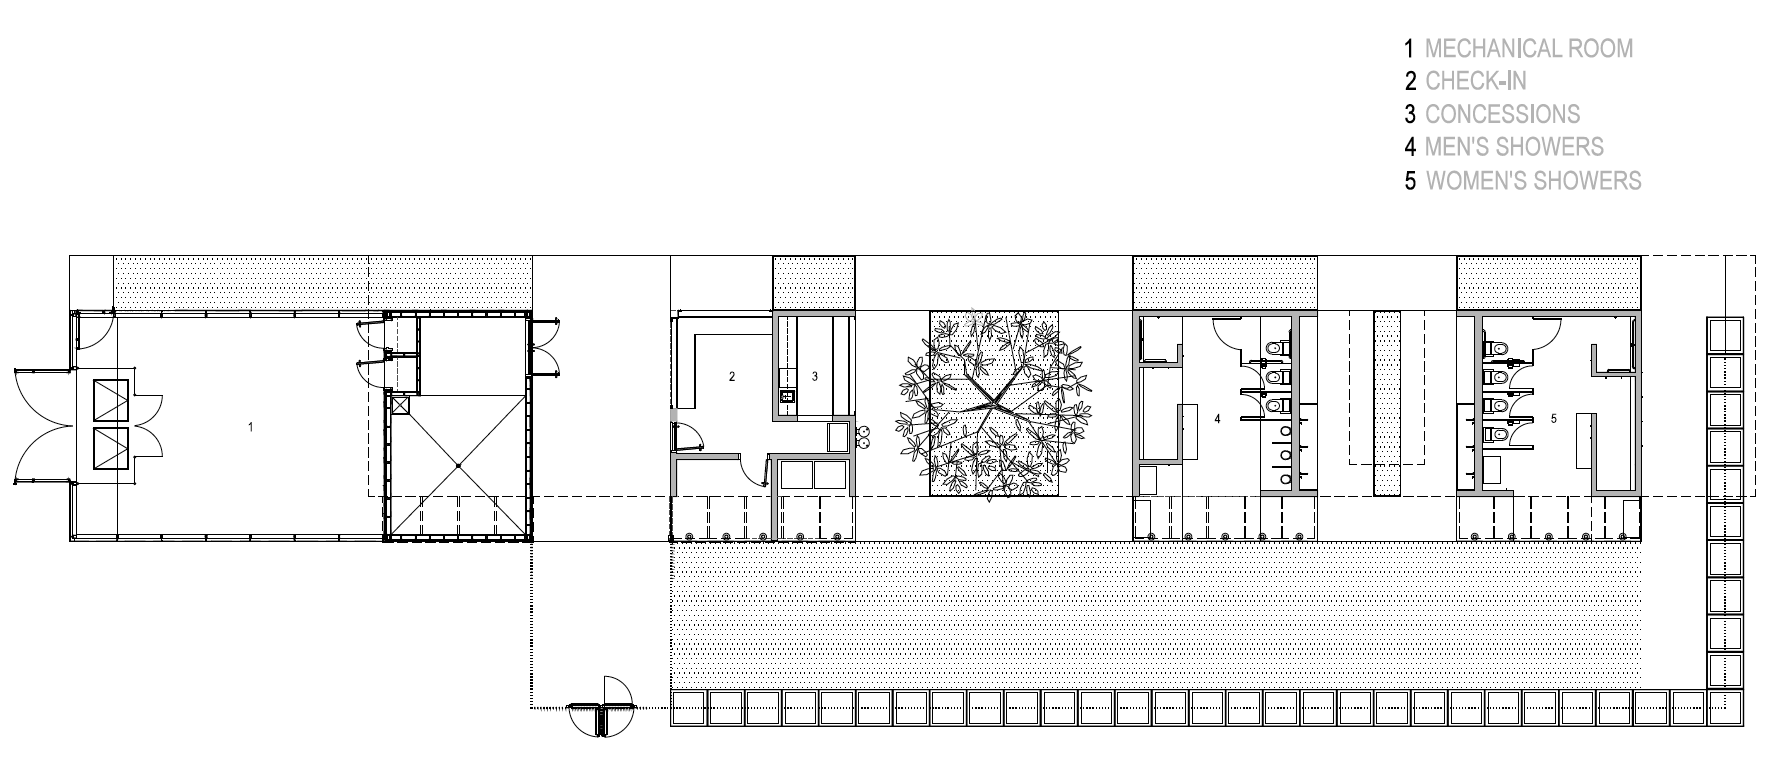 Pool House 3 image 5